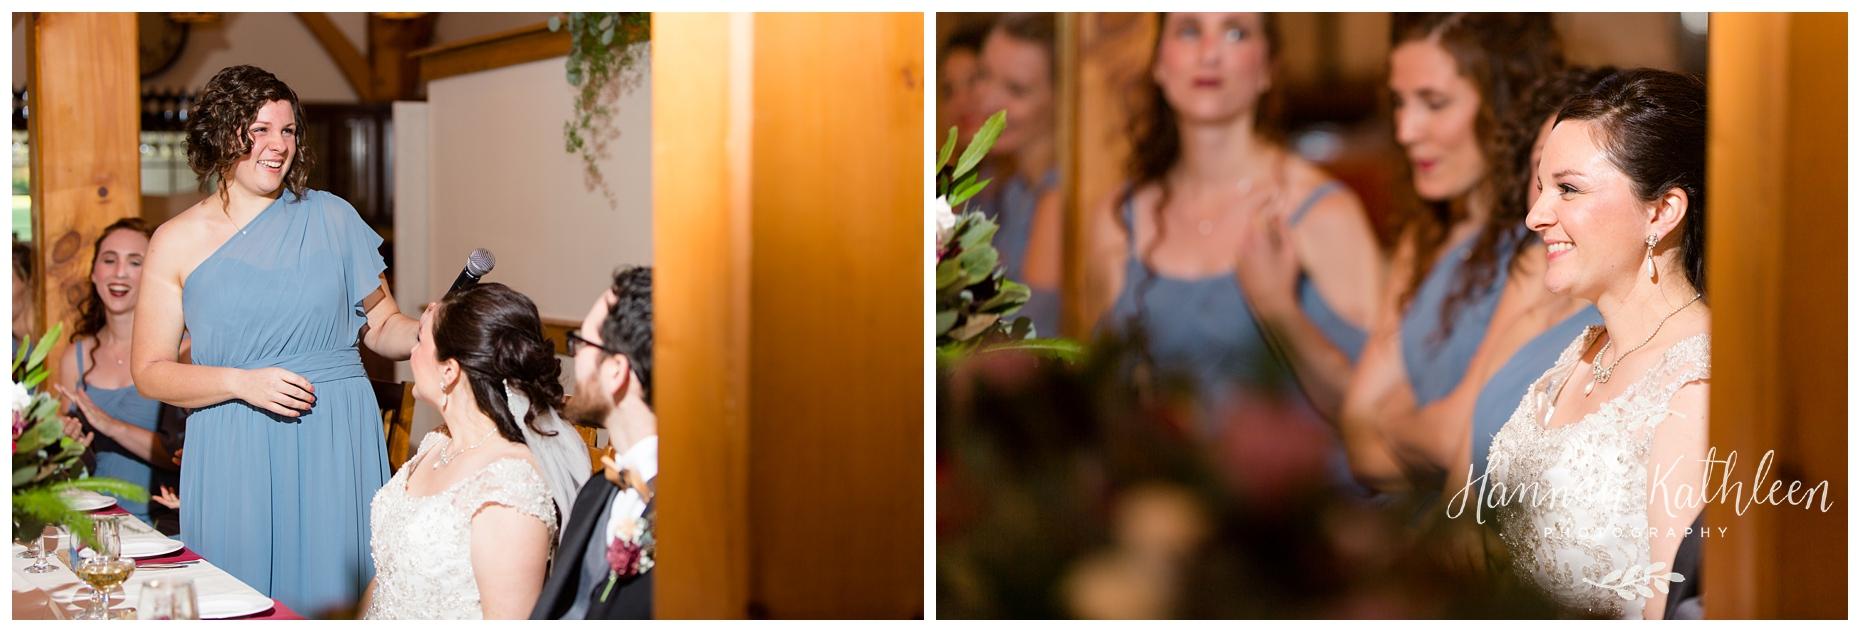 Karl_Rachel_Buffalo_Wedding_Photographer_Timberlodge_Arrowhead